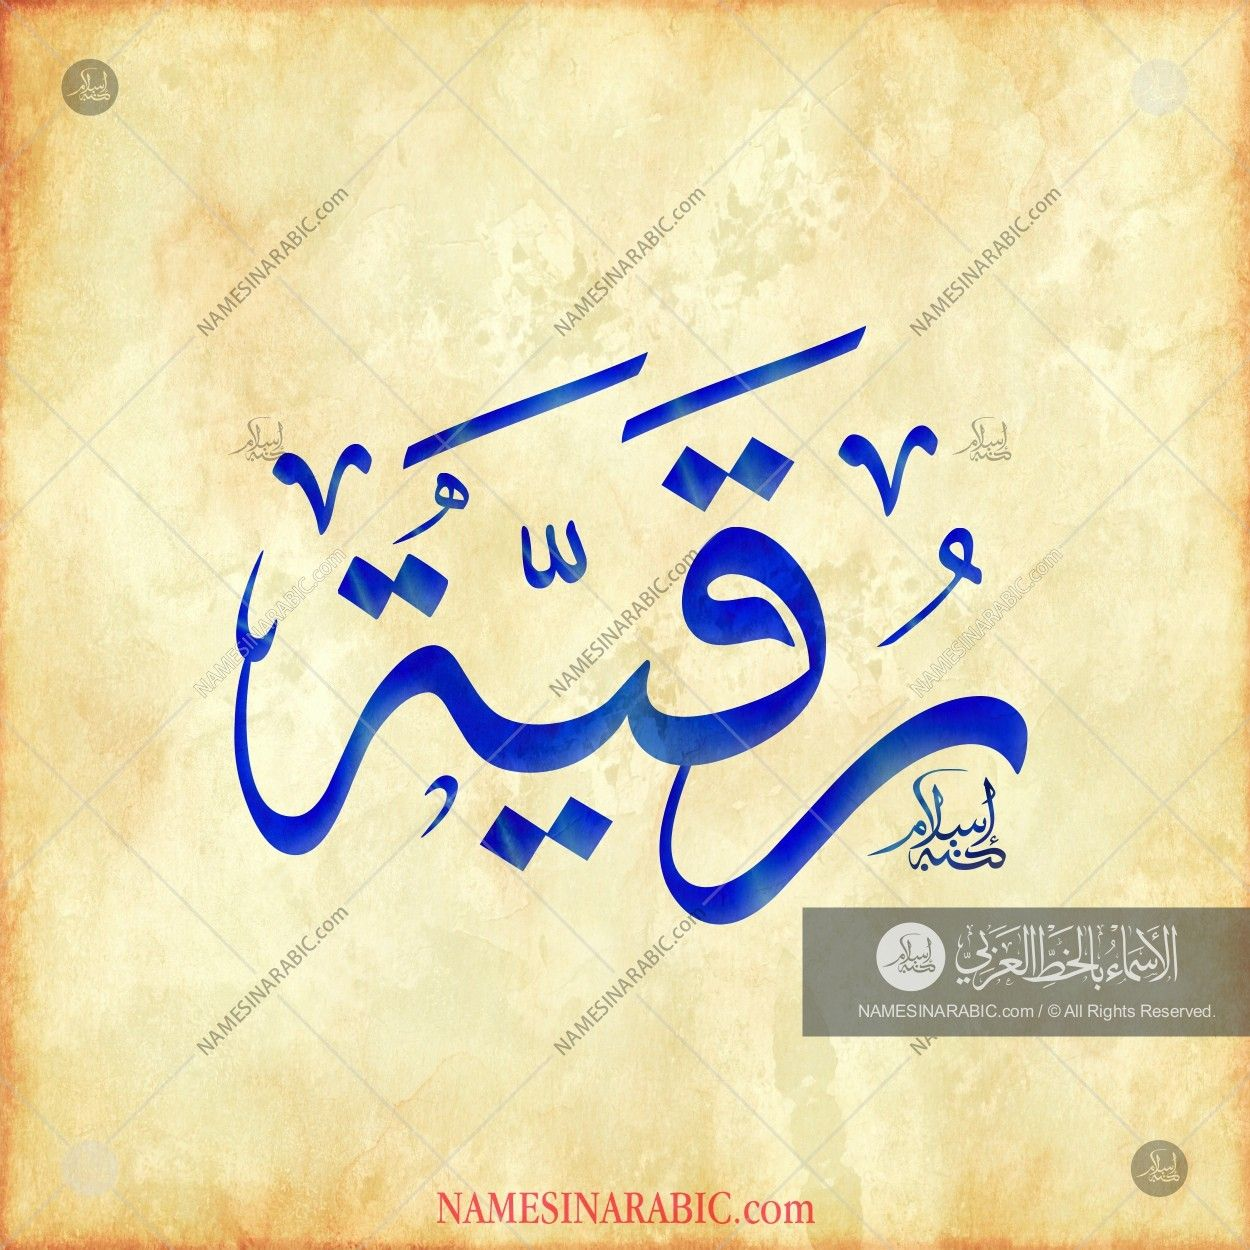 Ruqayyah Name In Arabic Calligraphy Calligraphy Logo Calligraphy Islamic Calligraphy